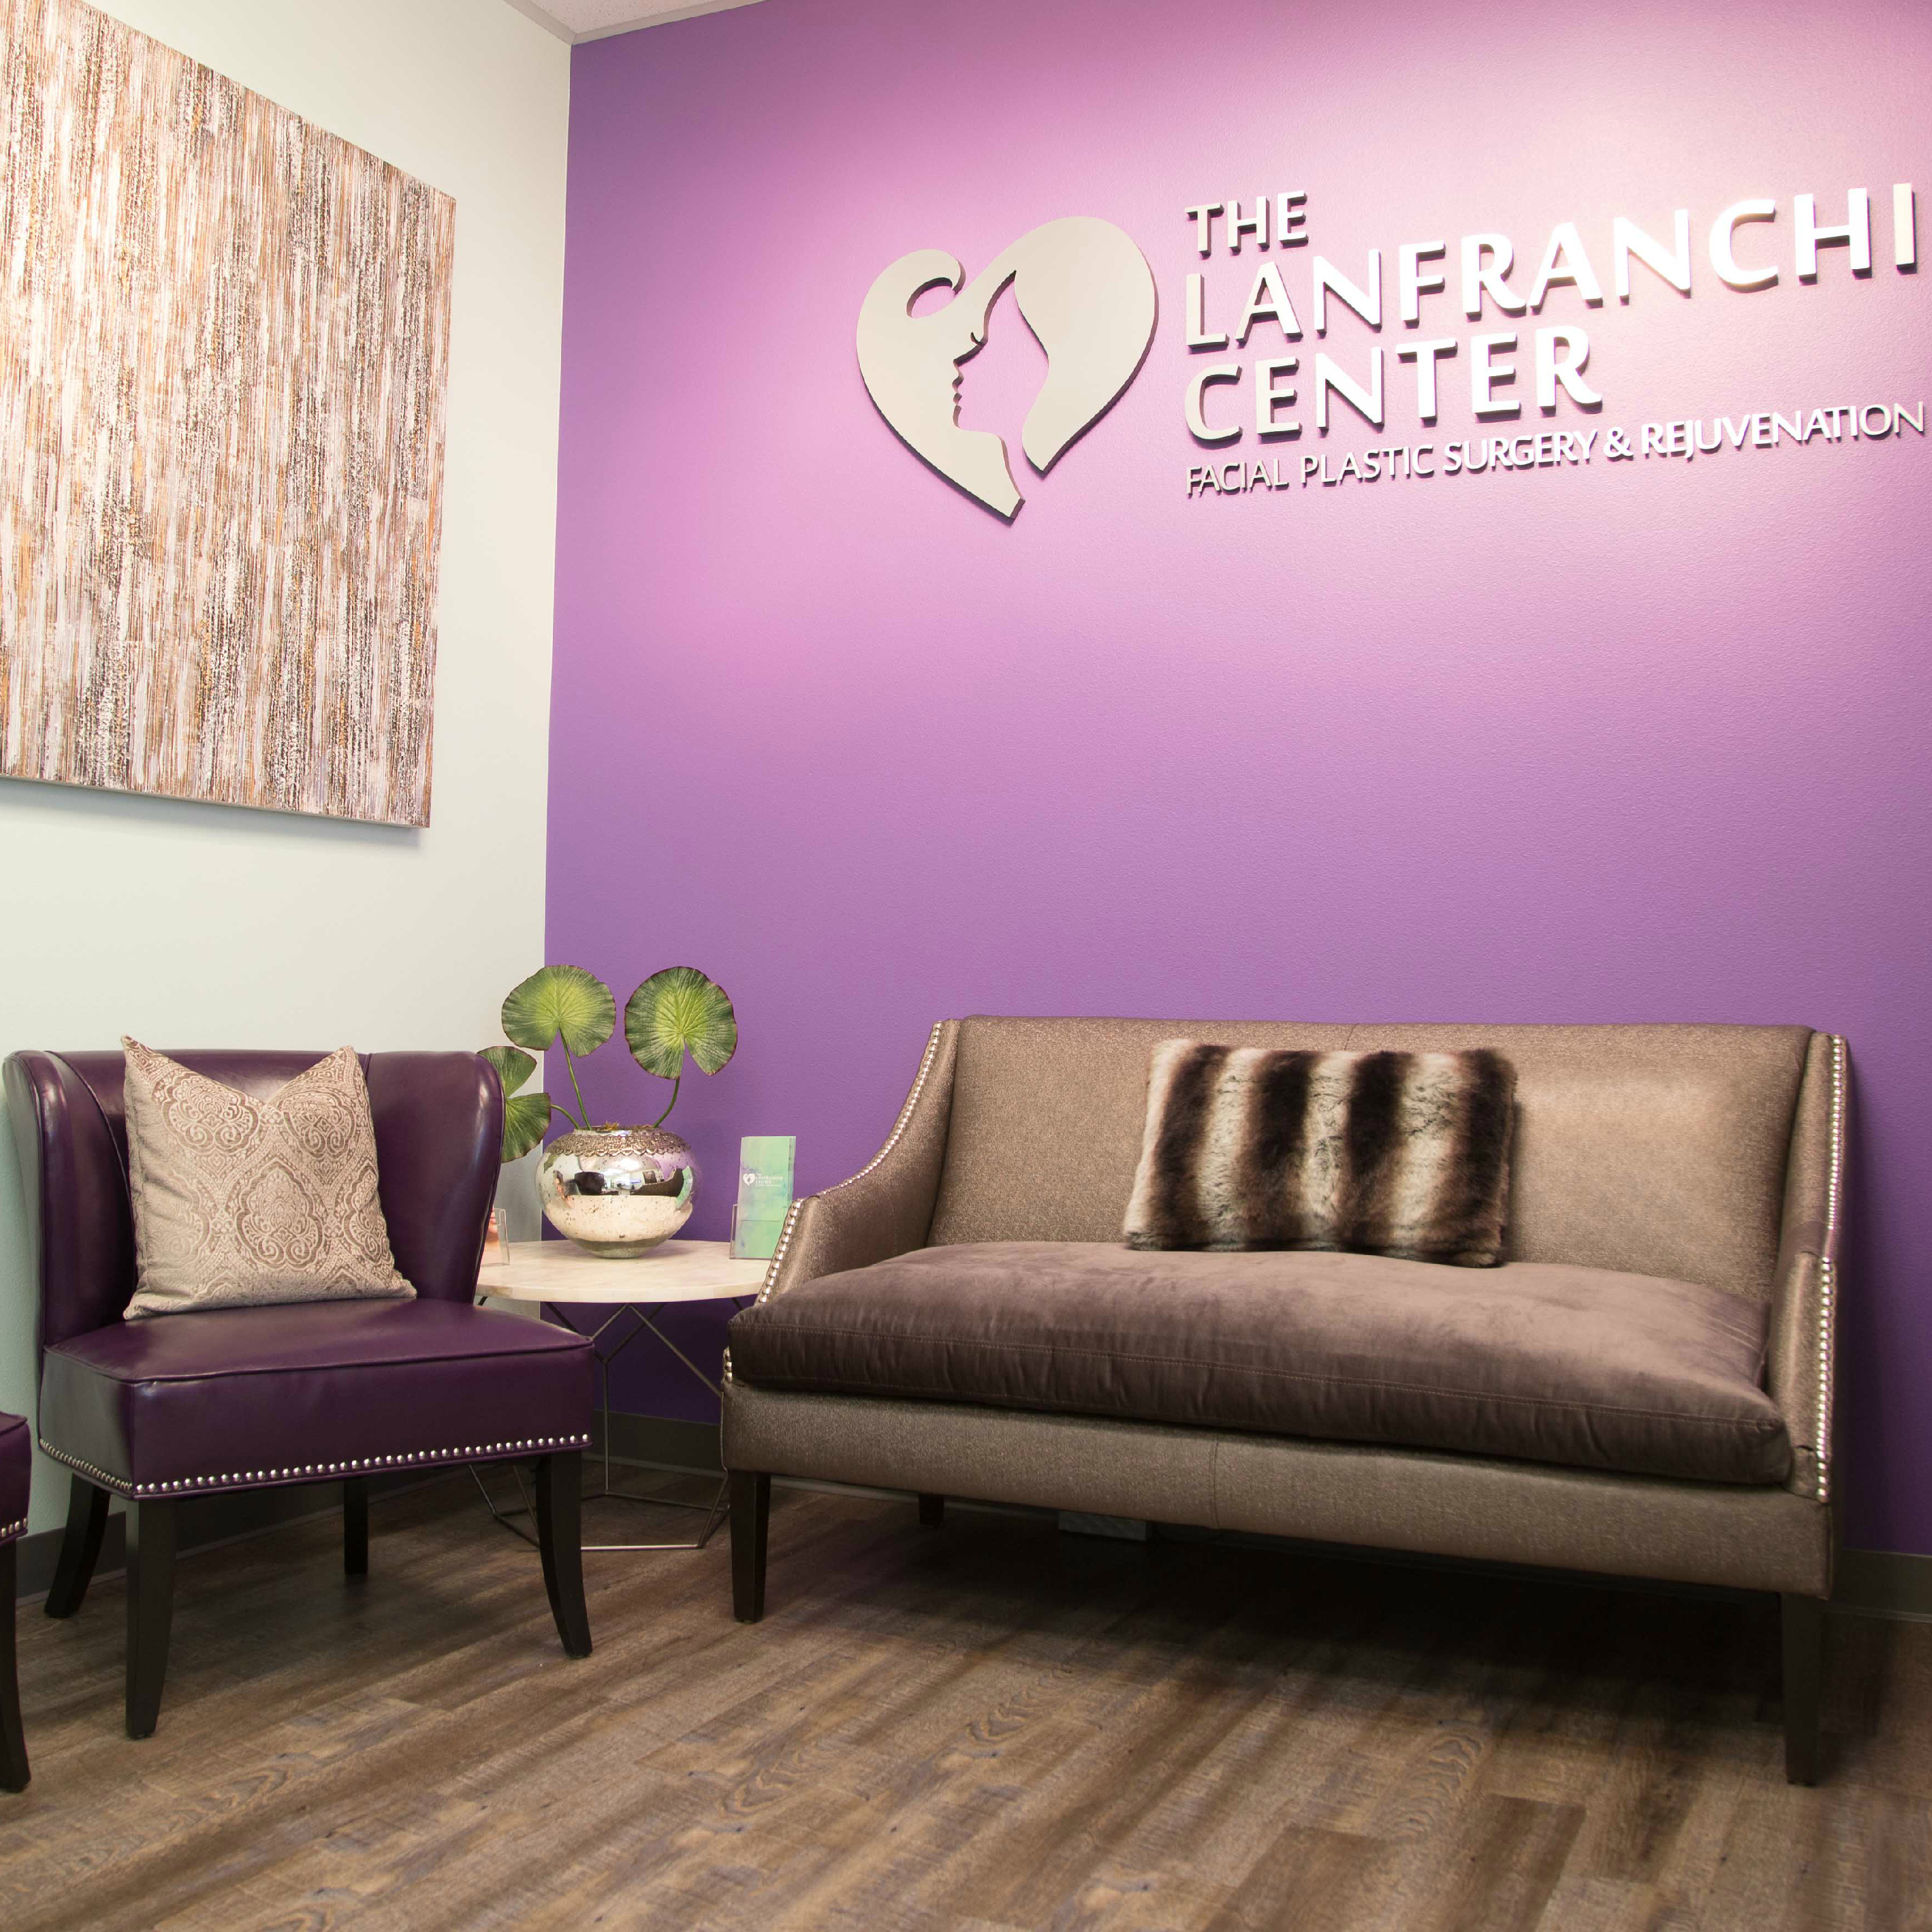 The Lanfranchi Center for Facial Plastic Surgery & Rejuvenation image 2